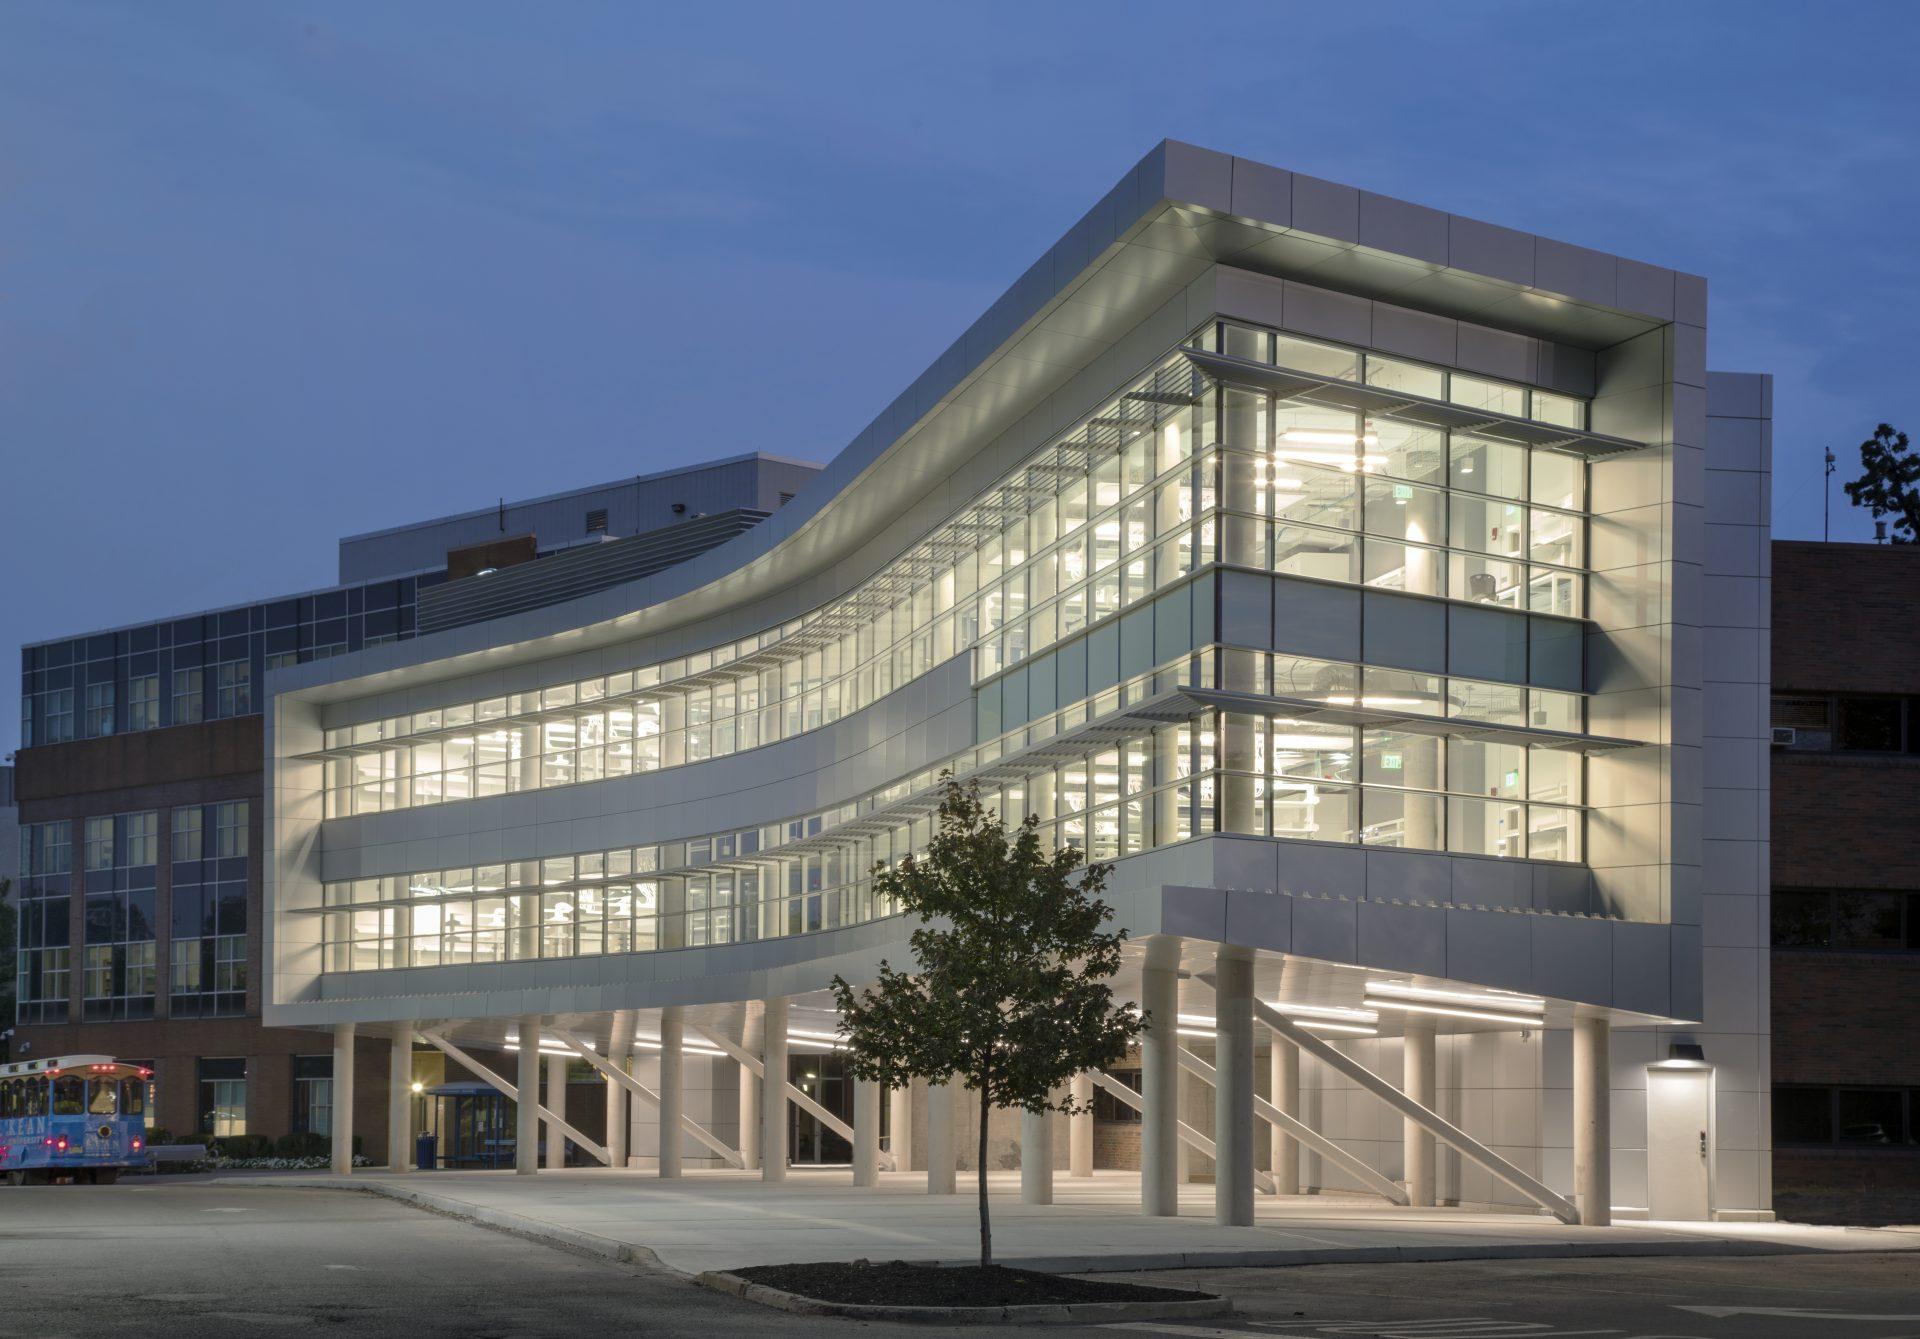 Kean University Science Building